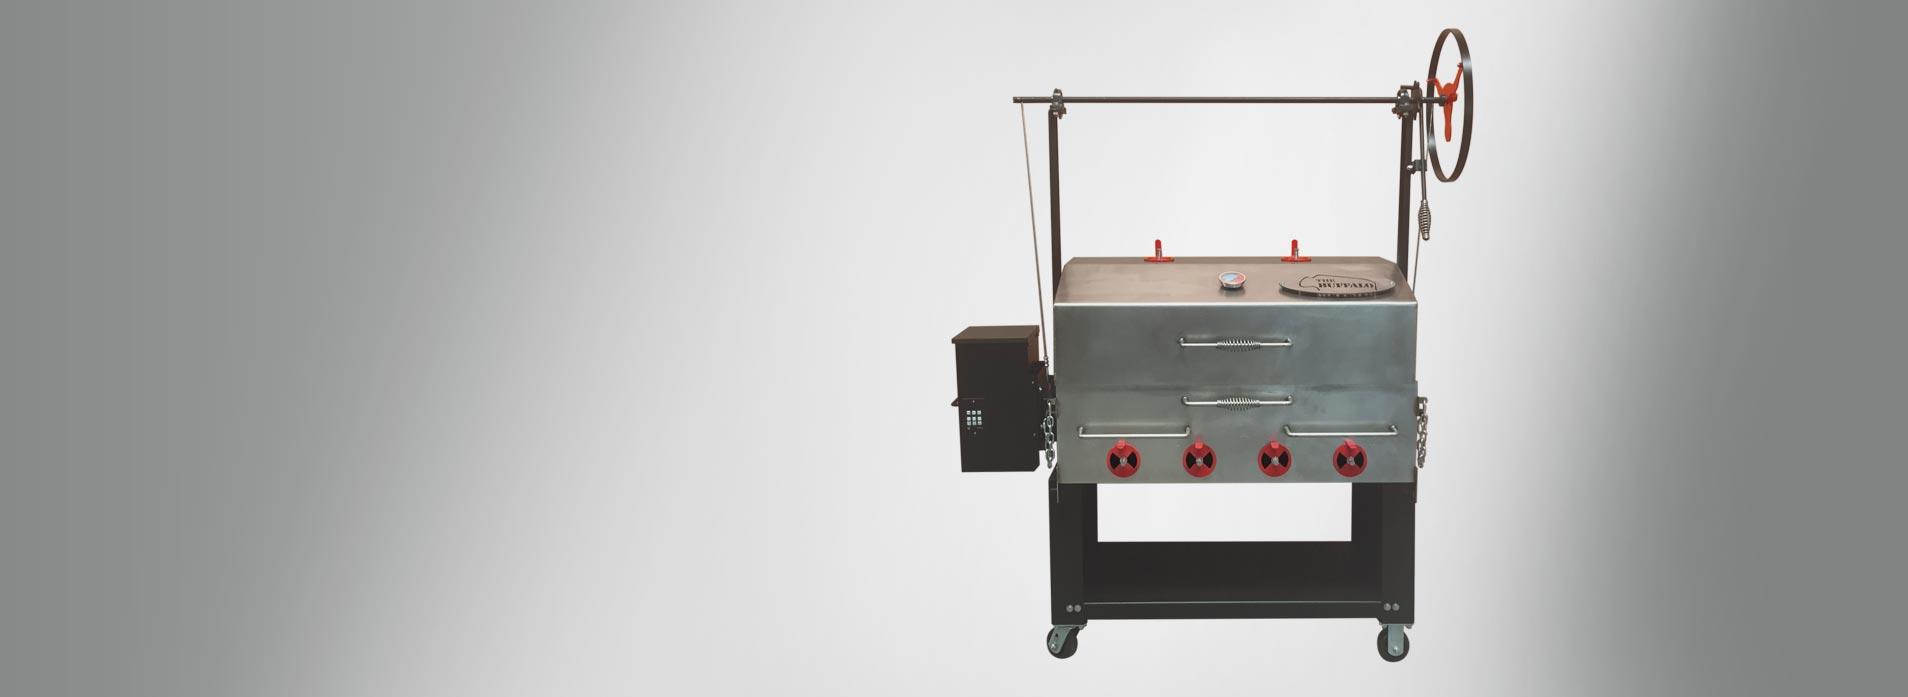 the-buffalo-grill-slider